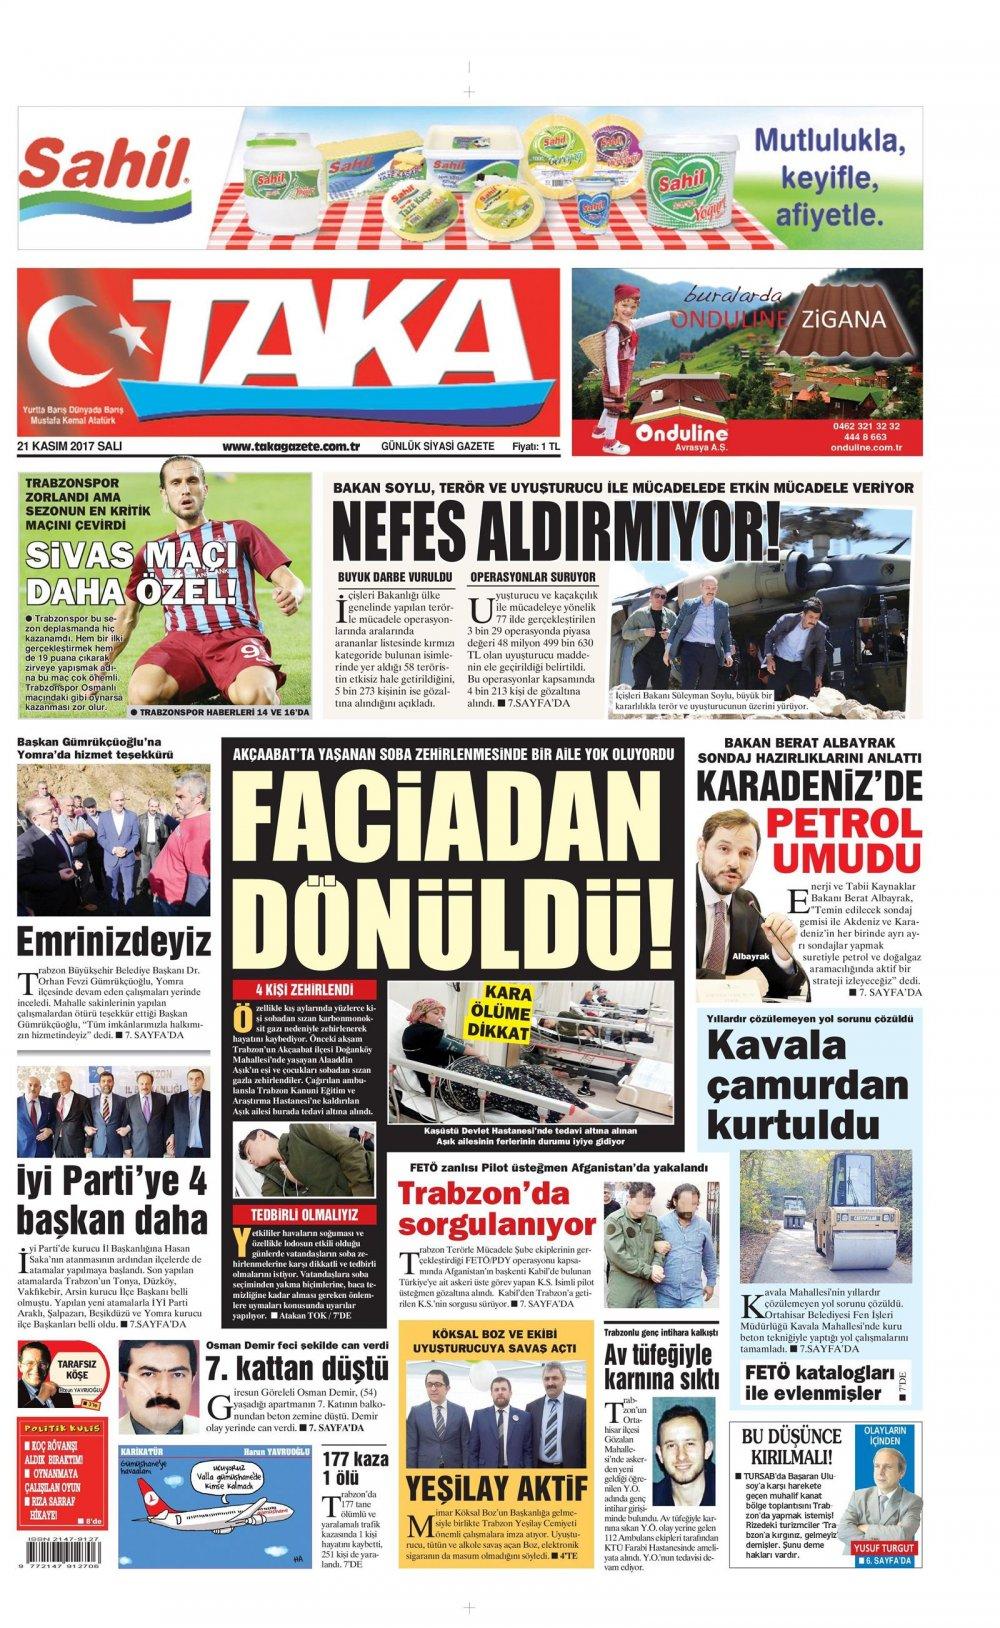 Taka Gazetesi